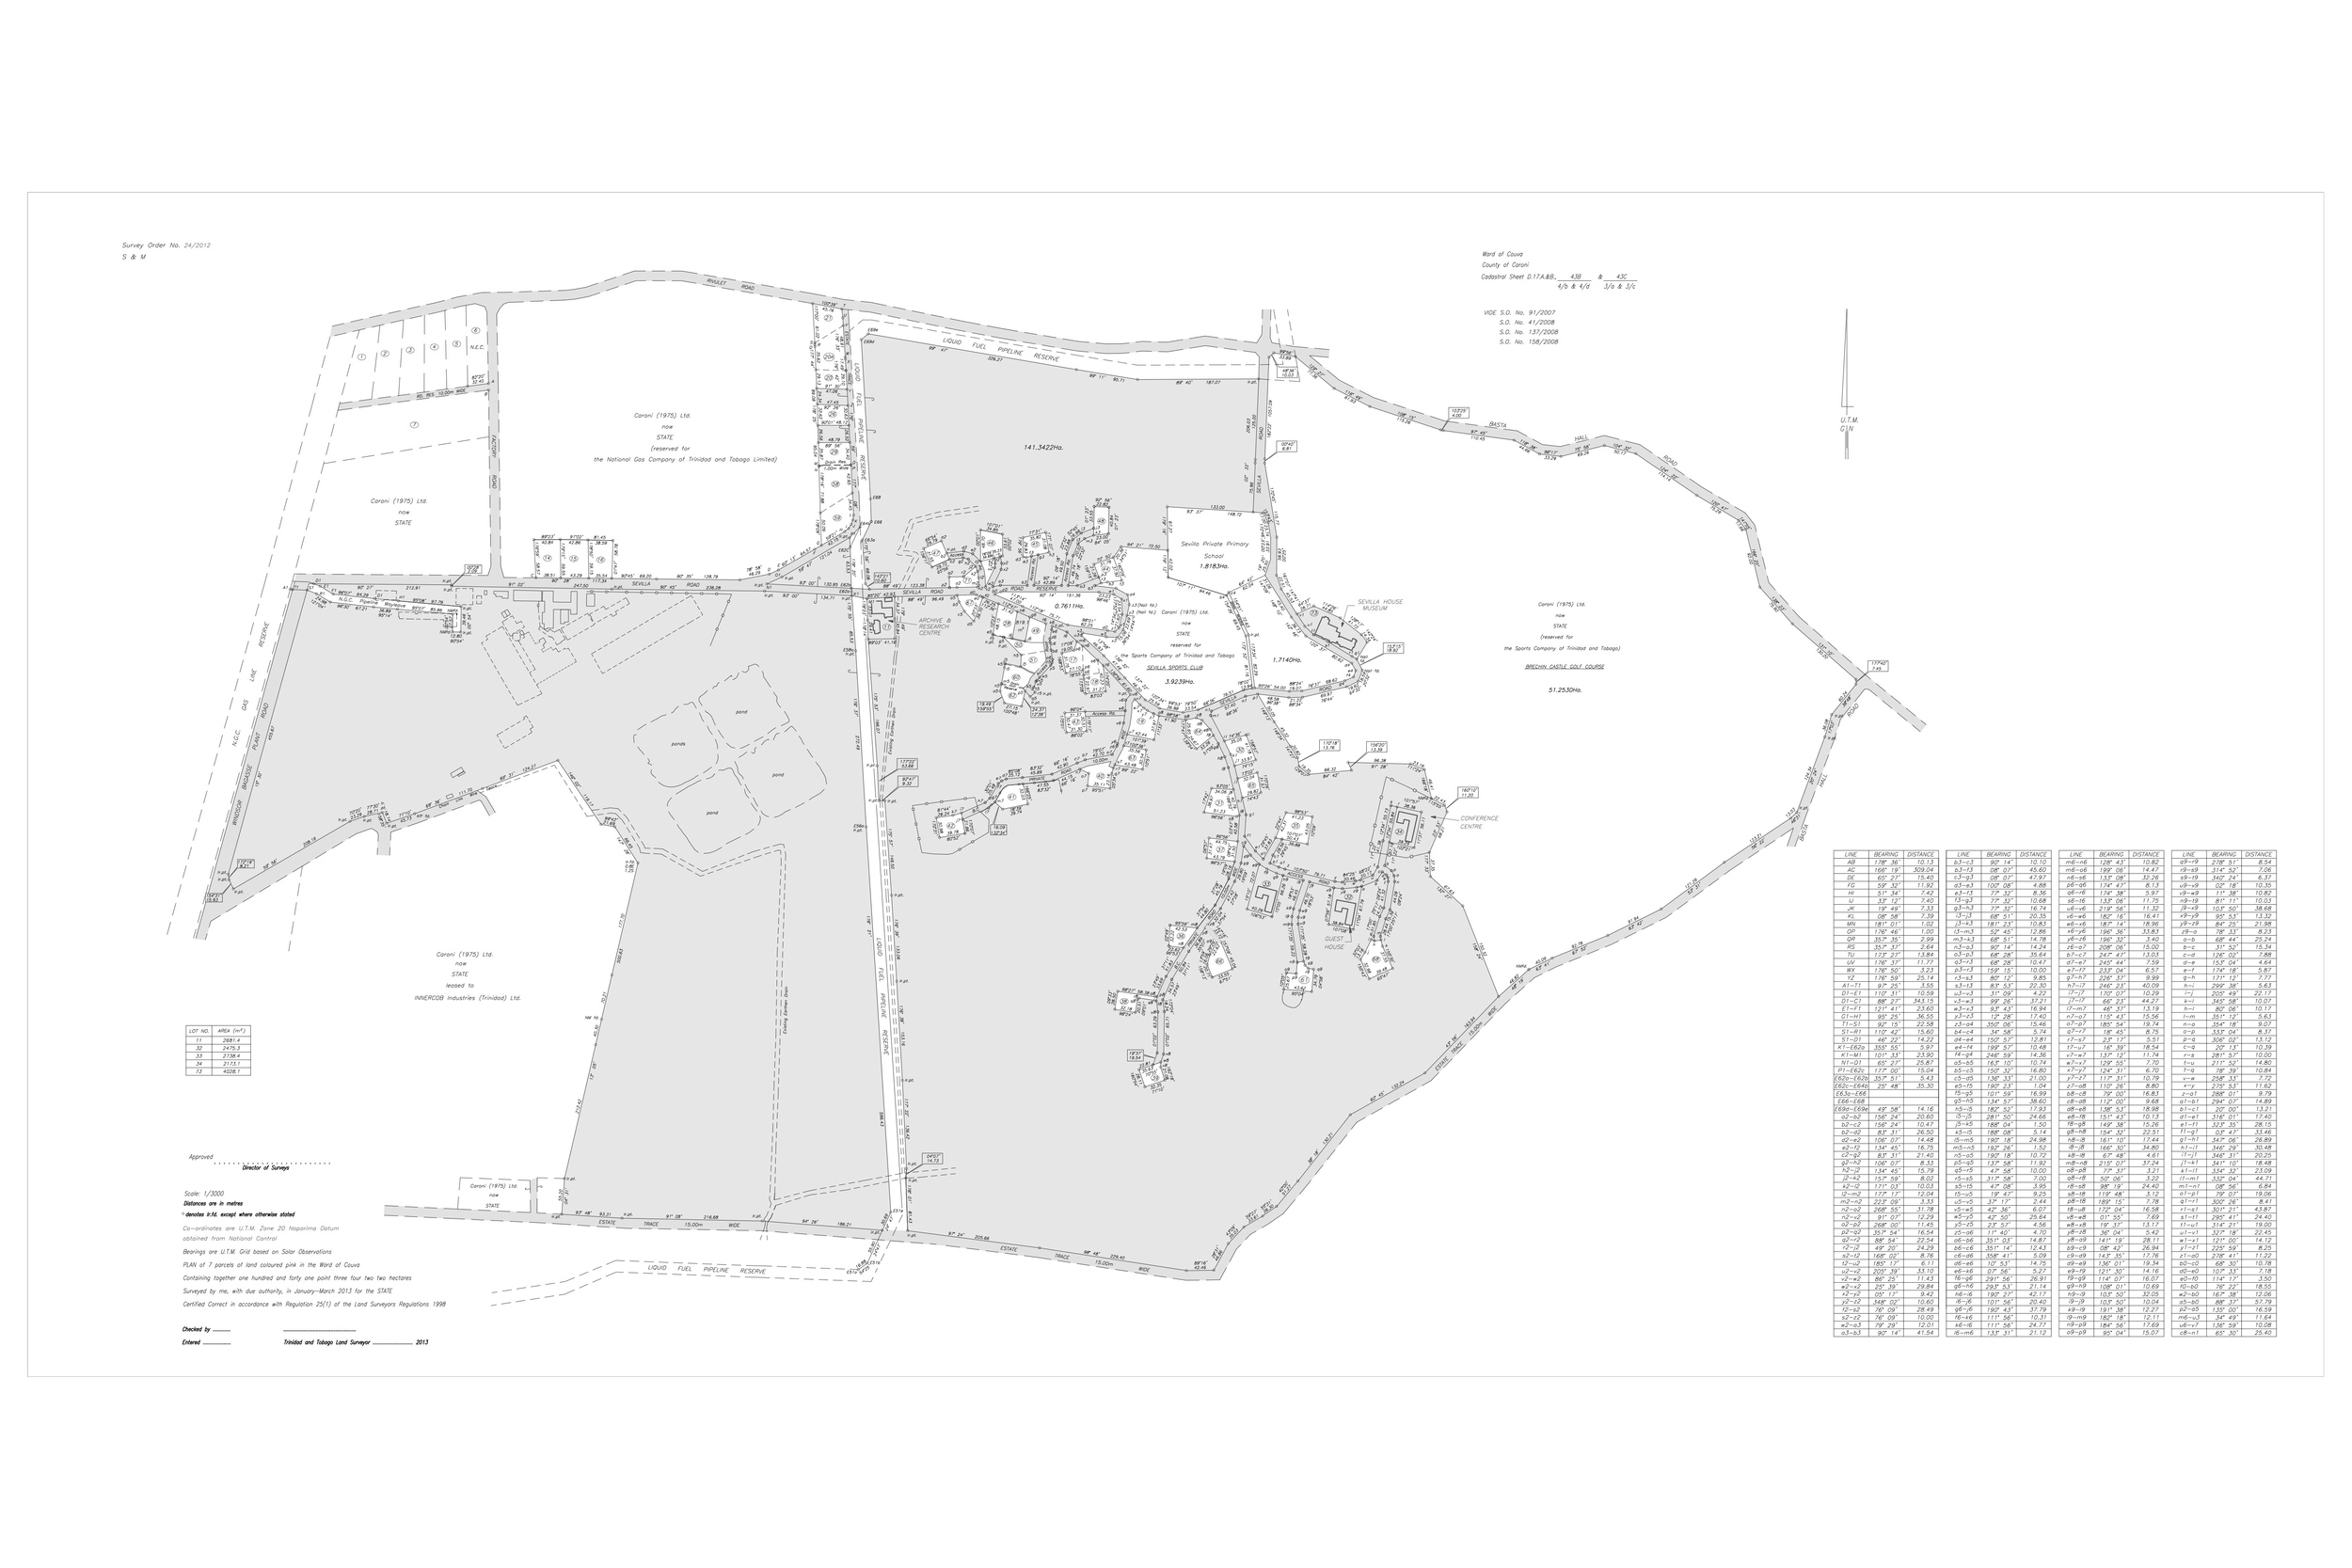 bc - site plan